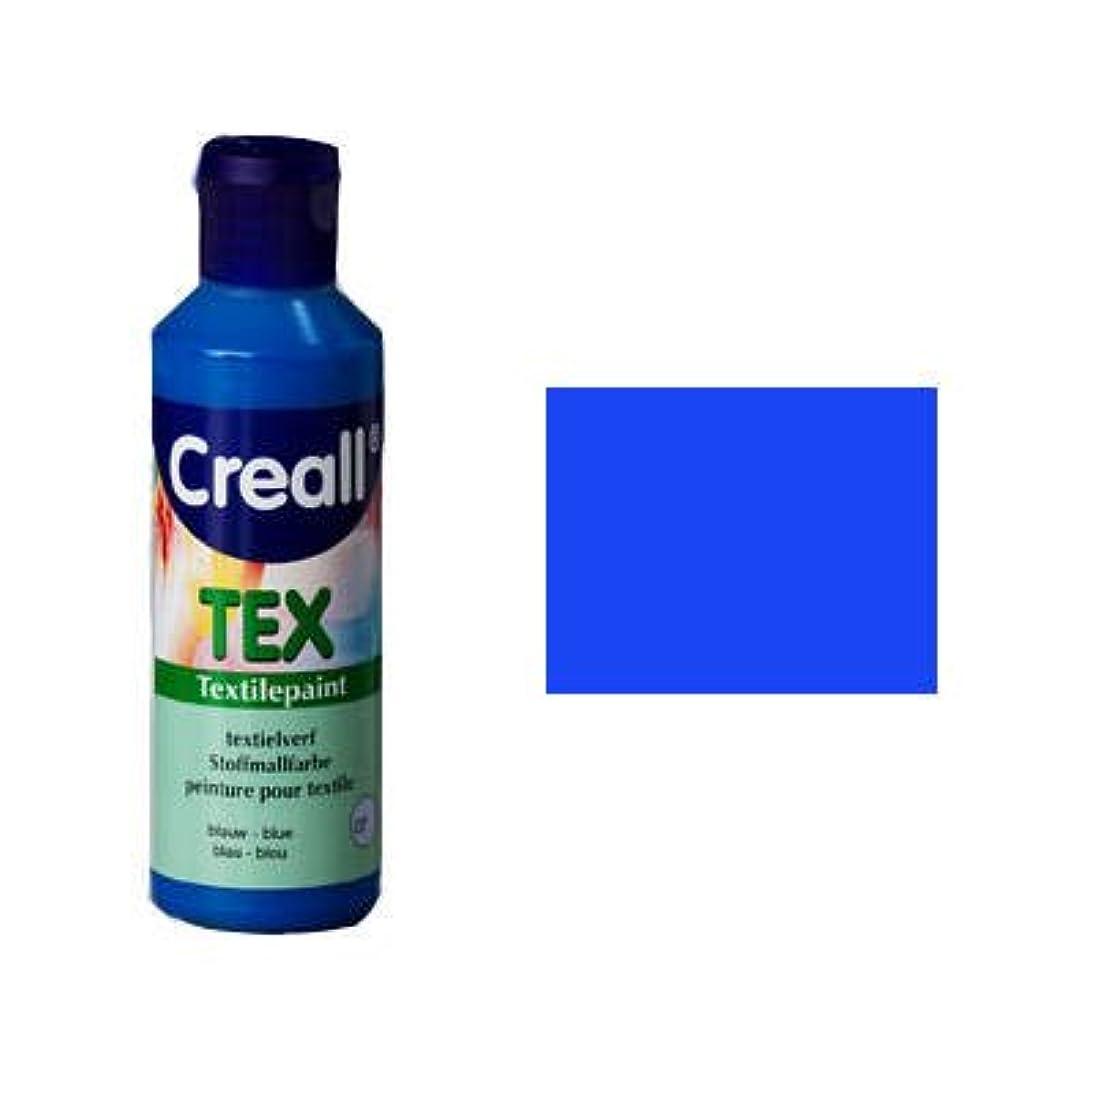 Creall Havo90713 80 ml 07 Blue Havo Textile Paint Bottle